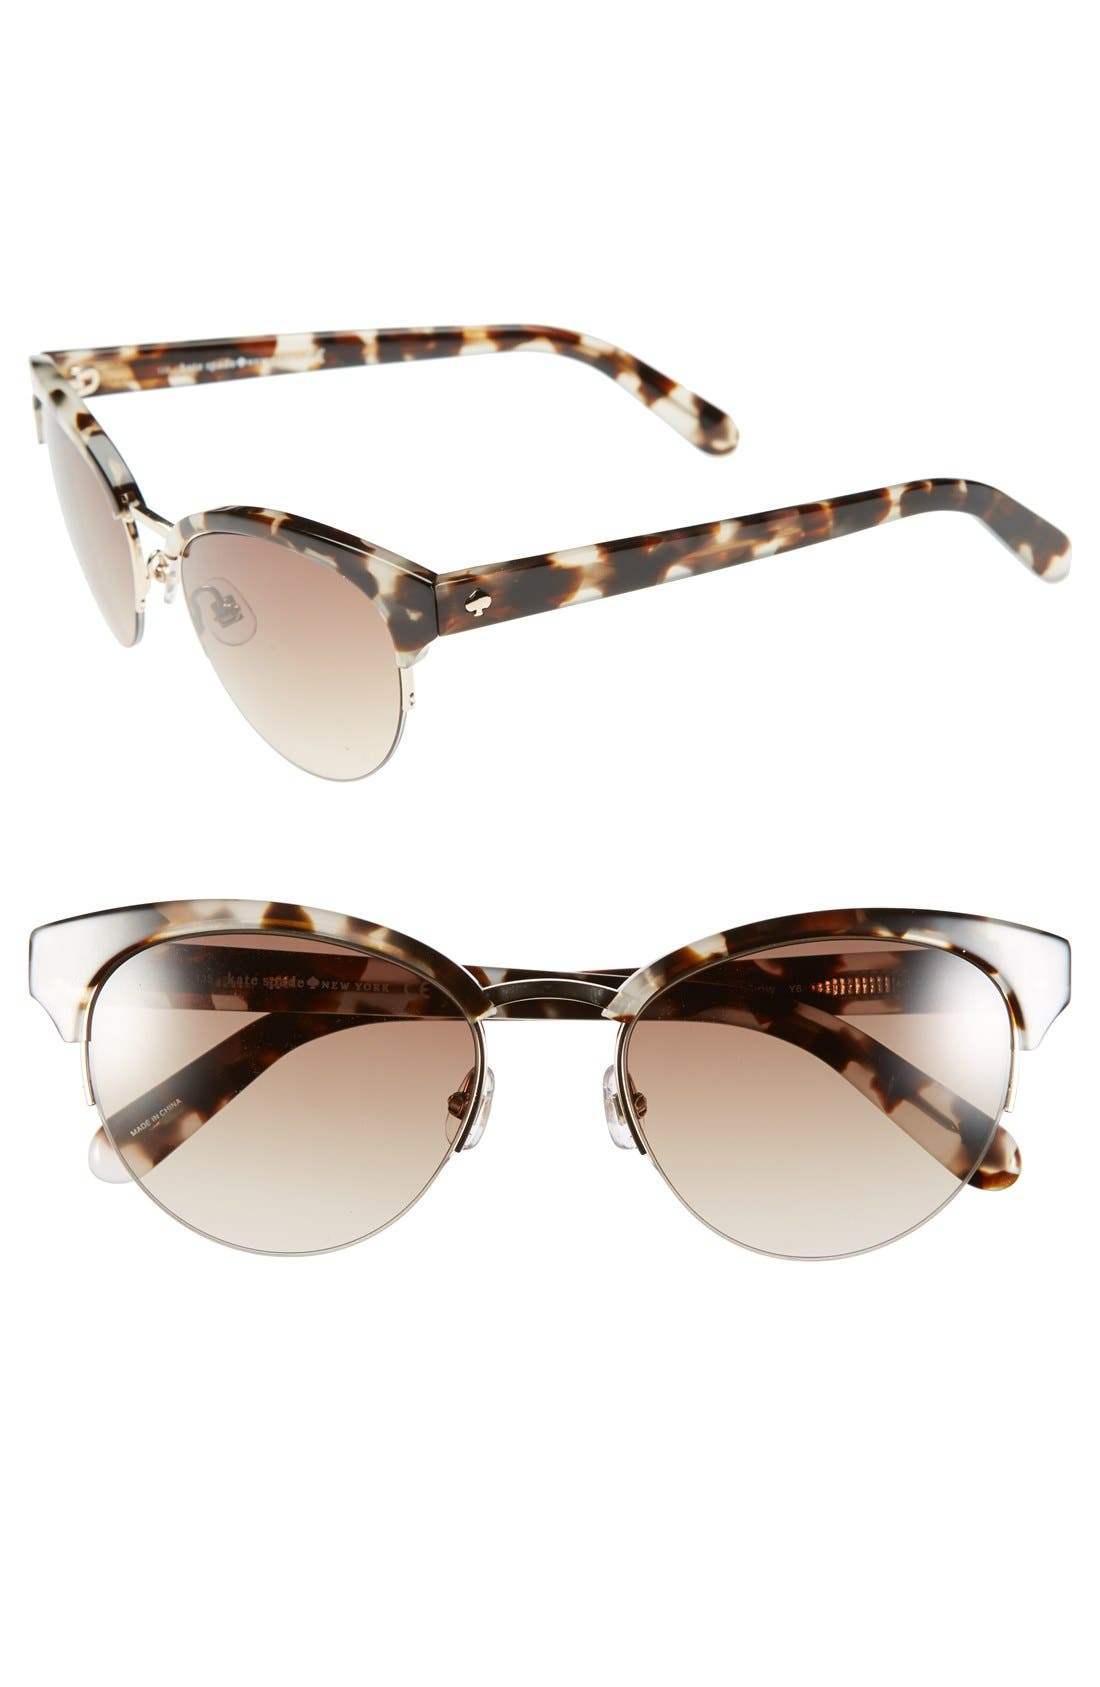 Main Image - kate spade new york 53mm cat eye sunglasses